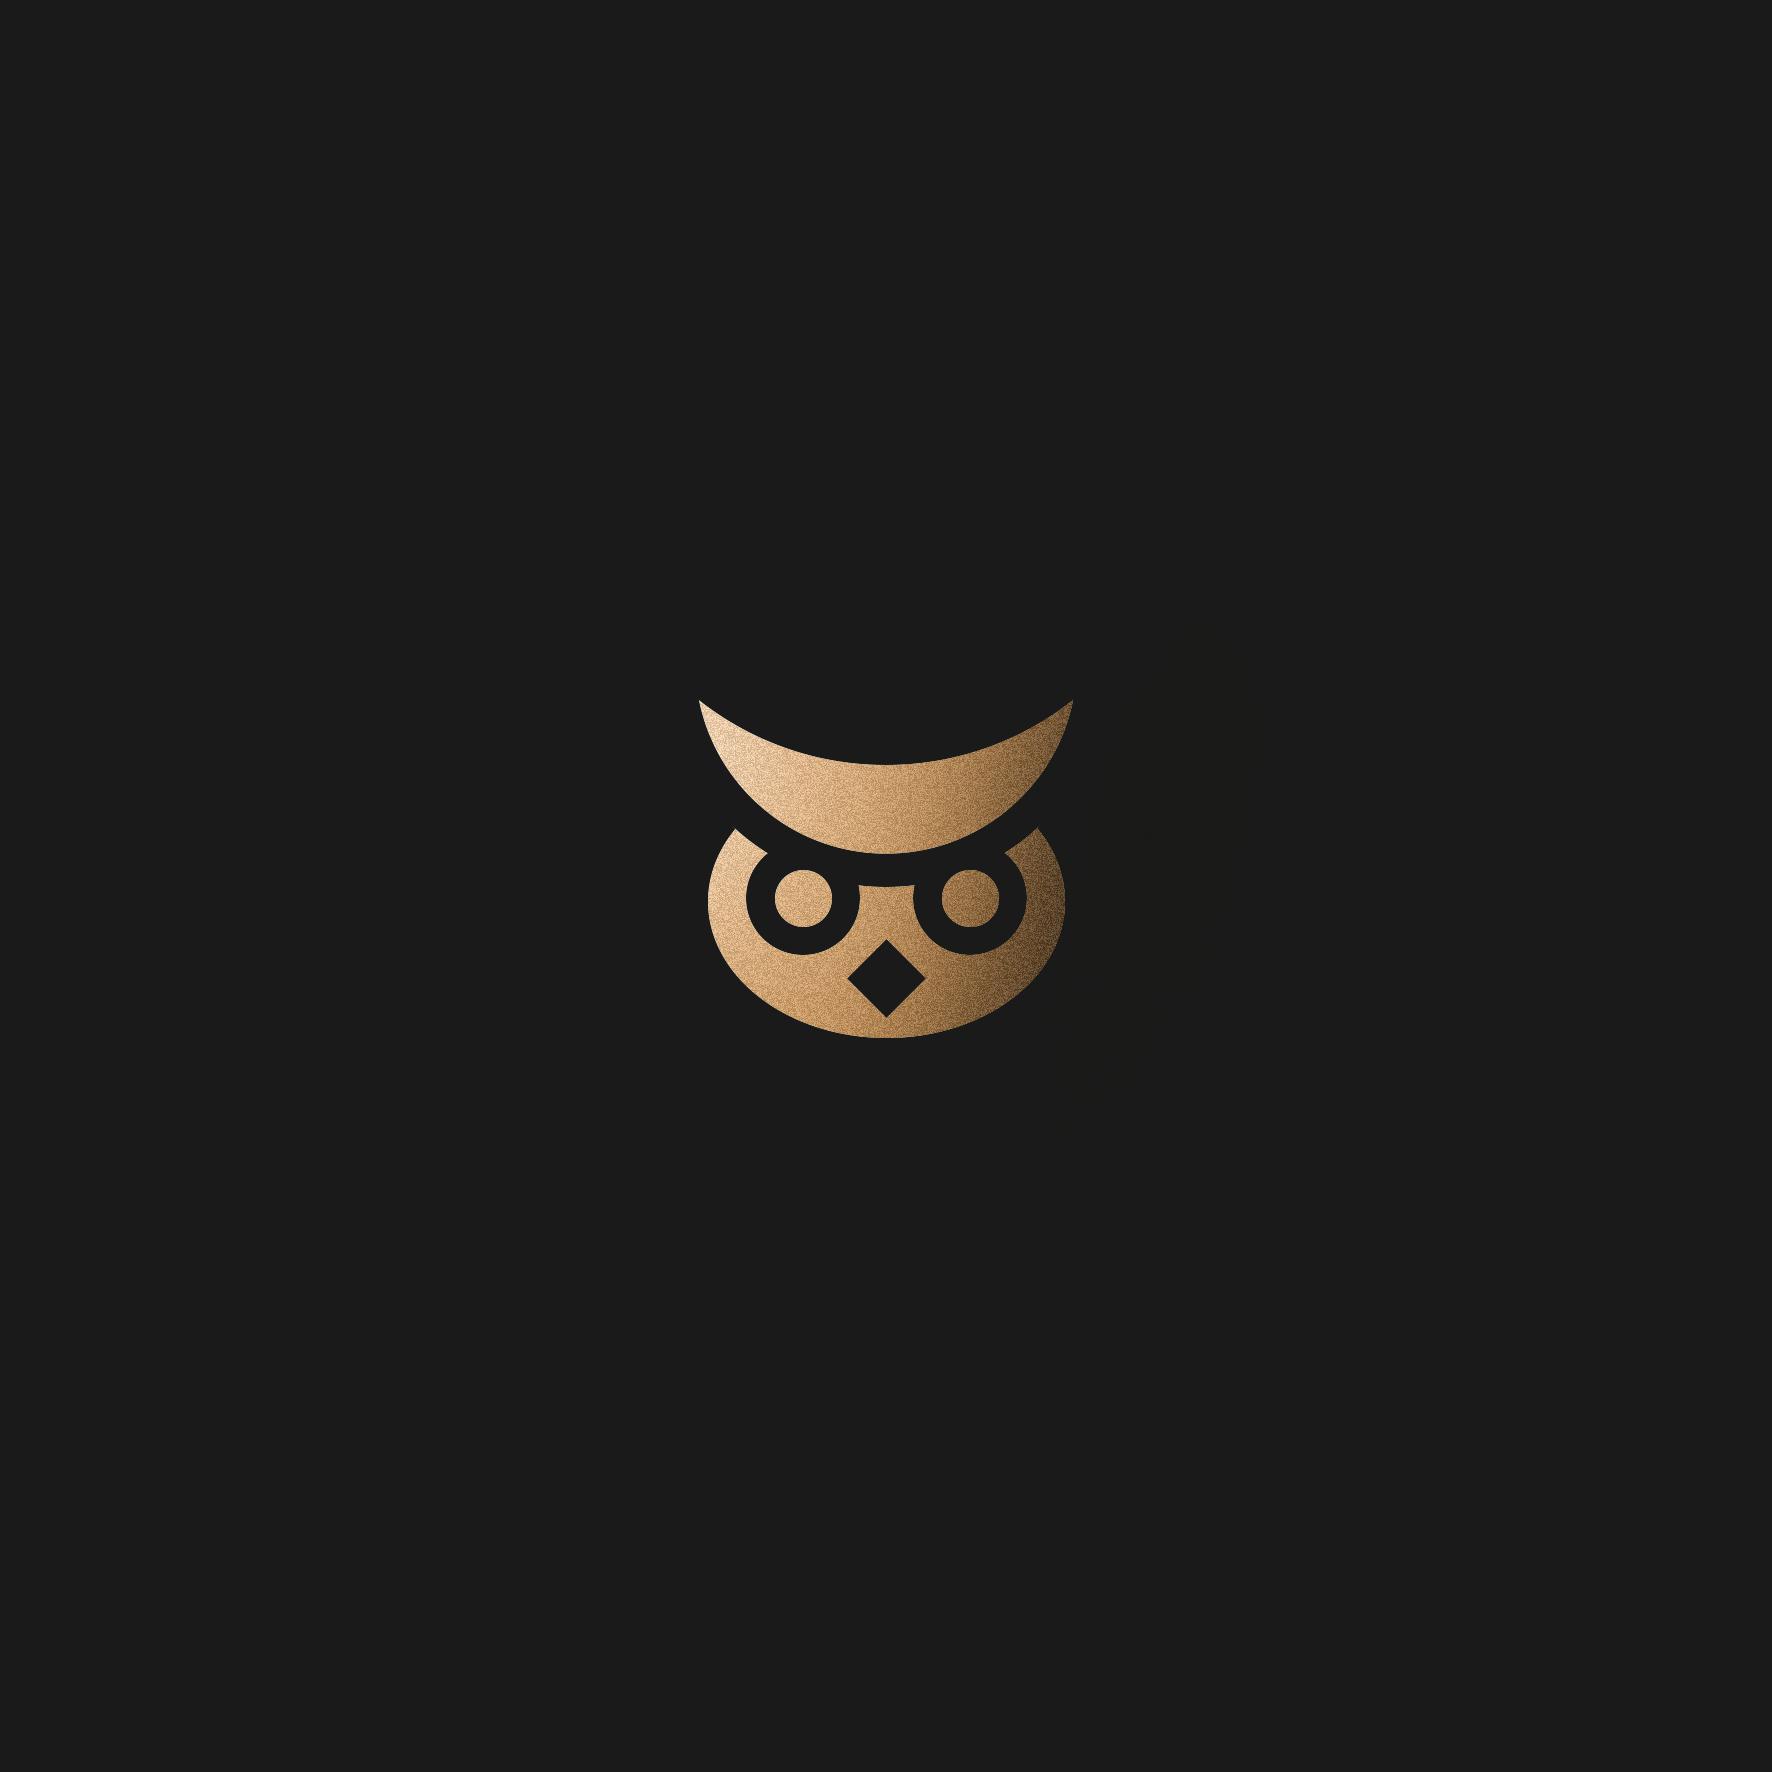 Ребрендинг логотипа сети кофеен фото f_0355e7f6390d8770.jpg